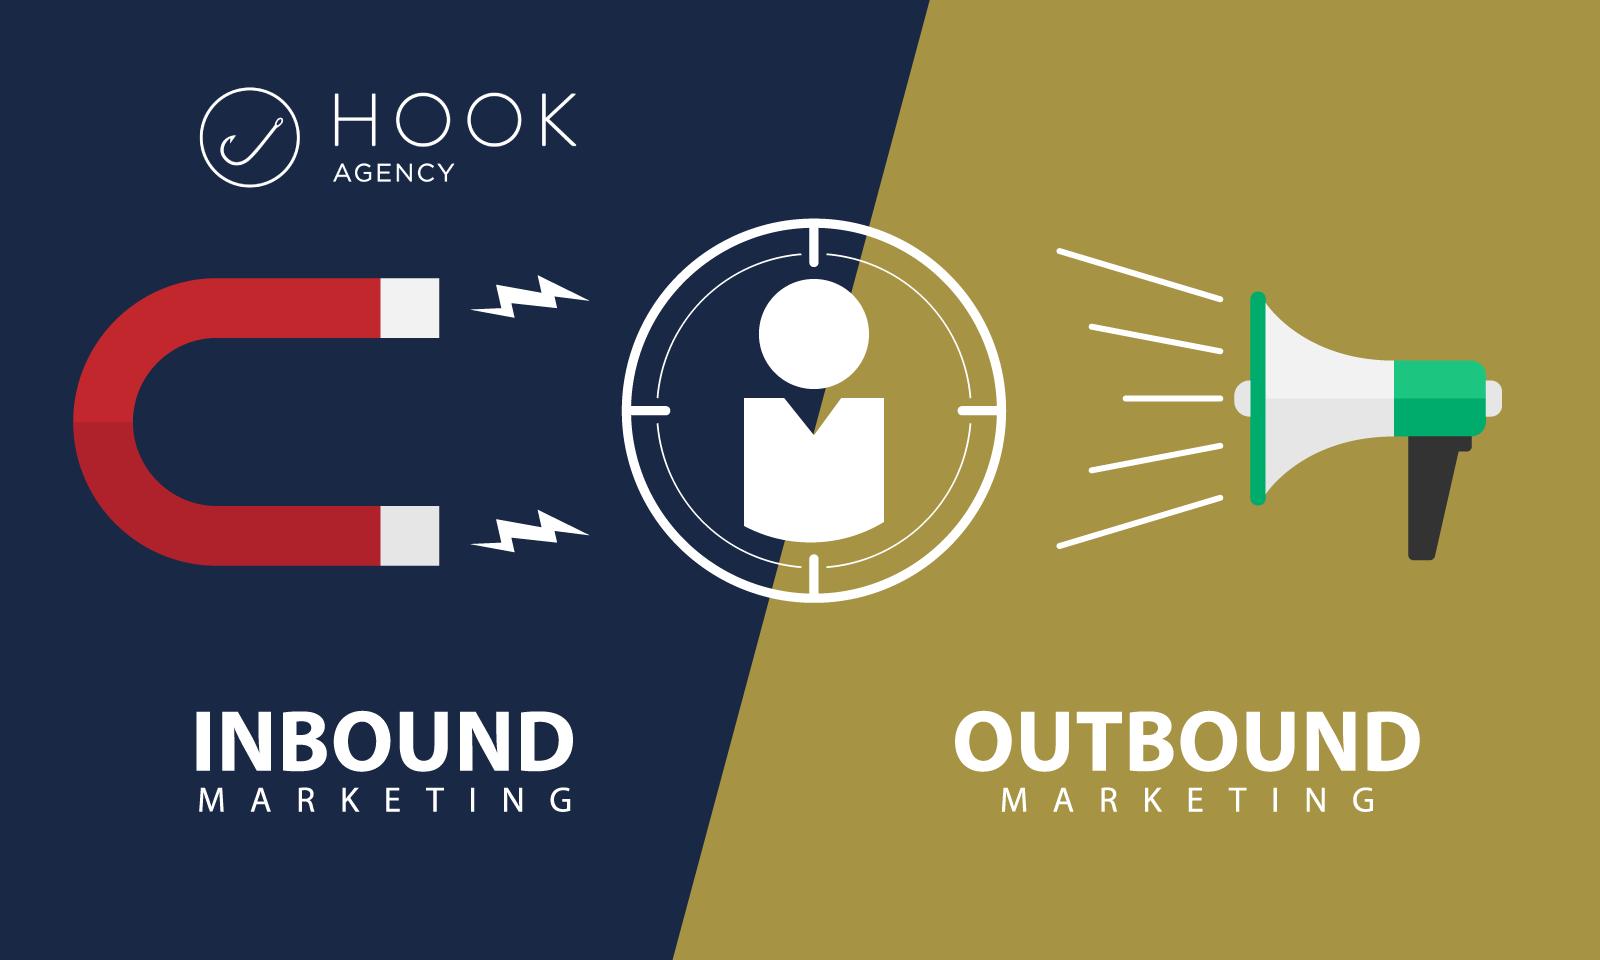 Inbound Vs. Outbound marketing examples